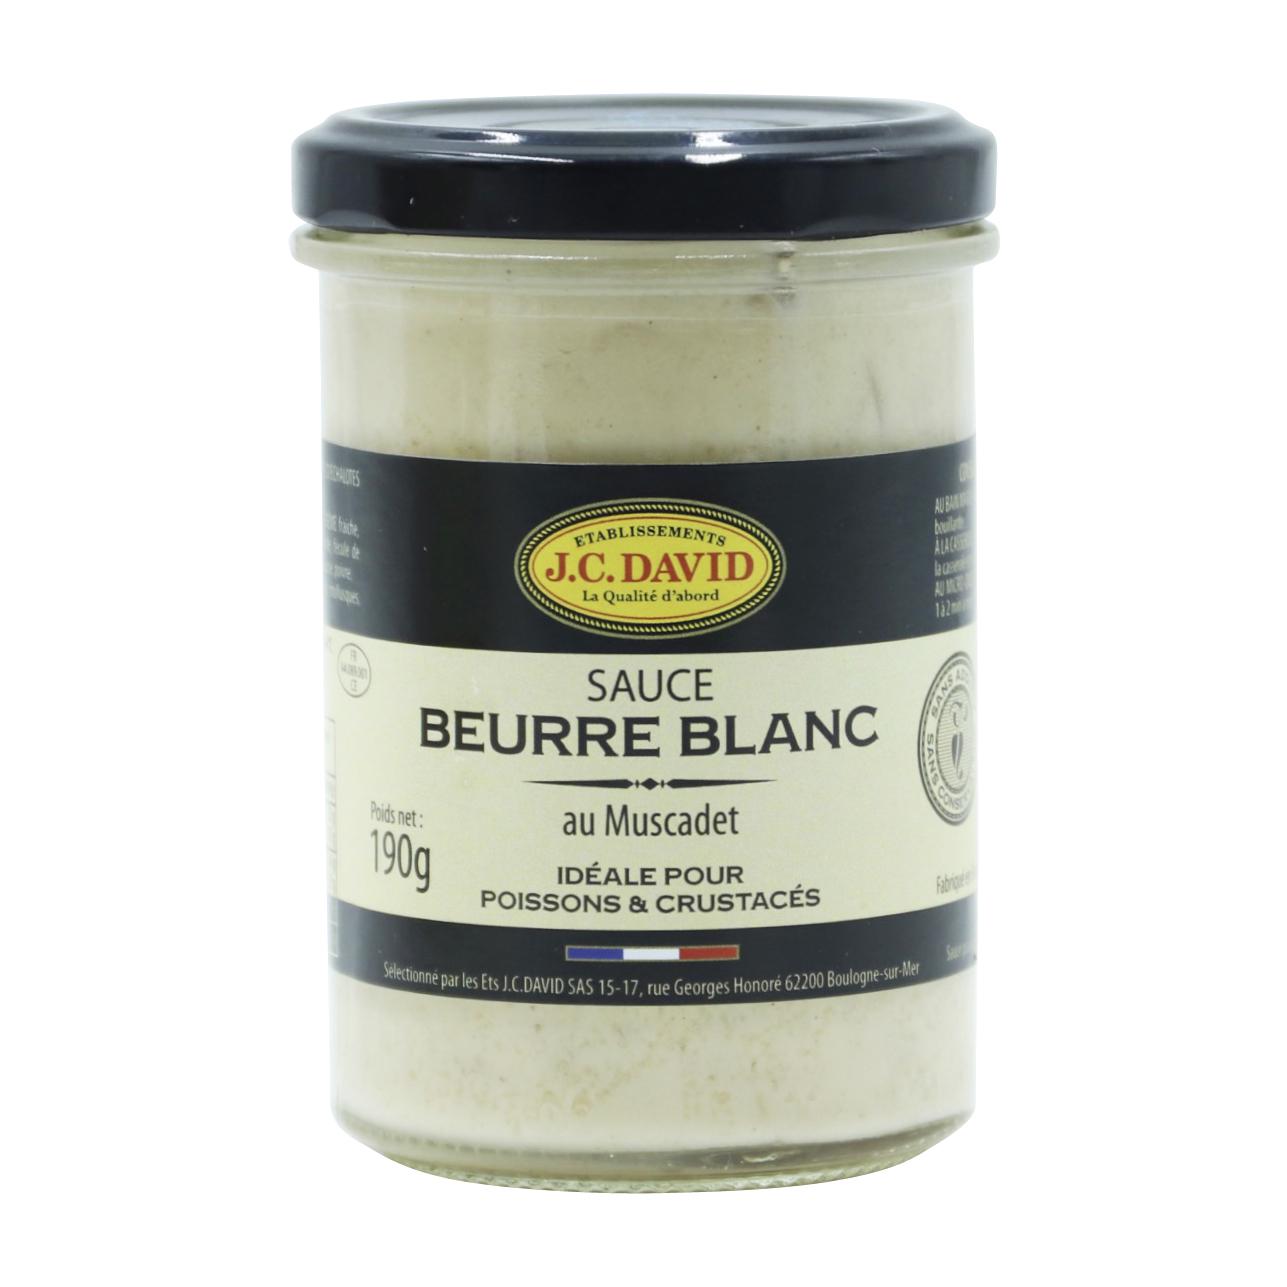 SAUCE BEURRE BLANC - 200g